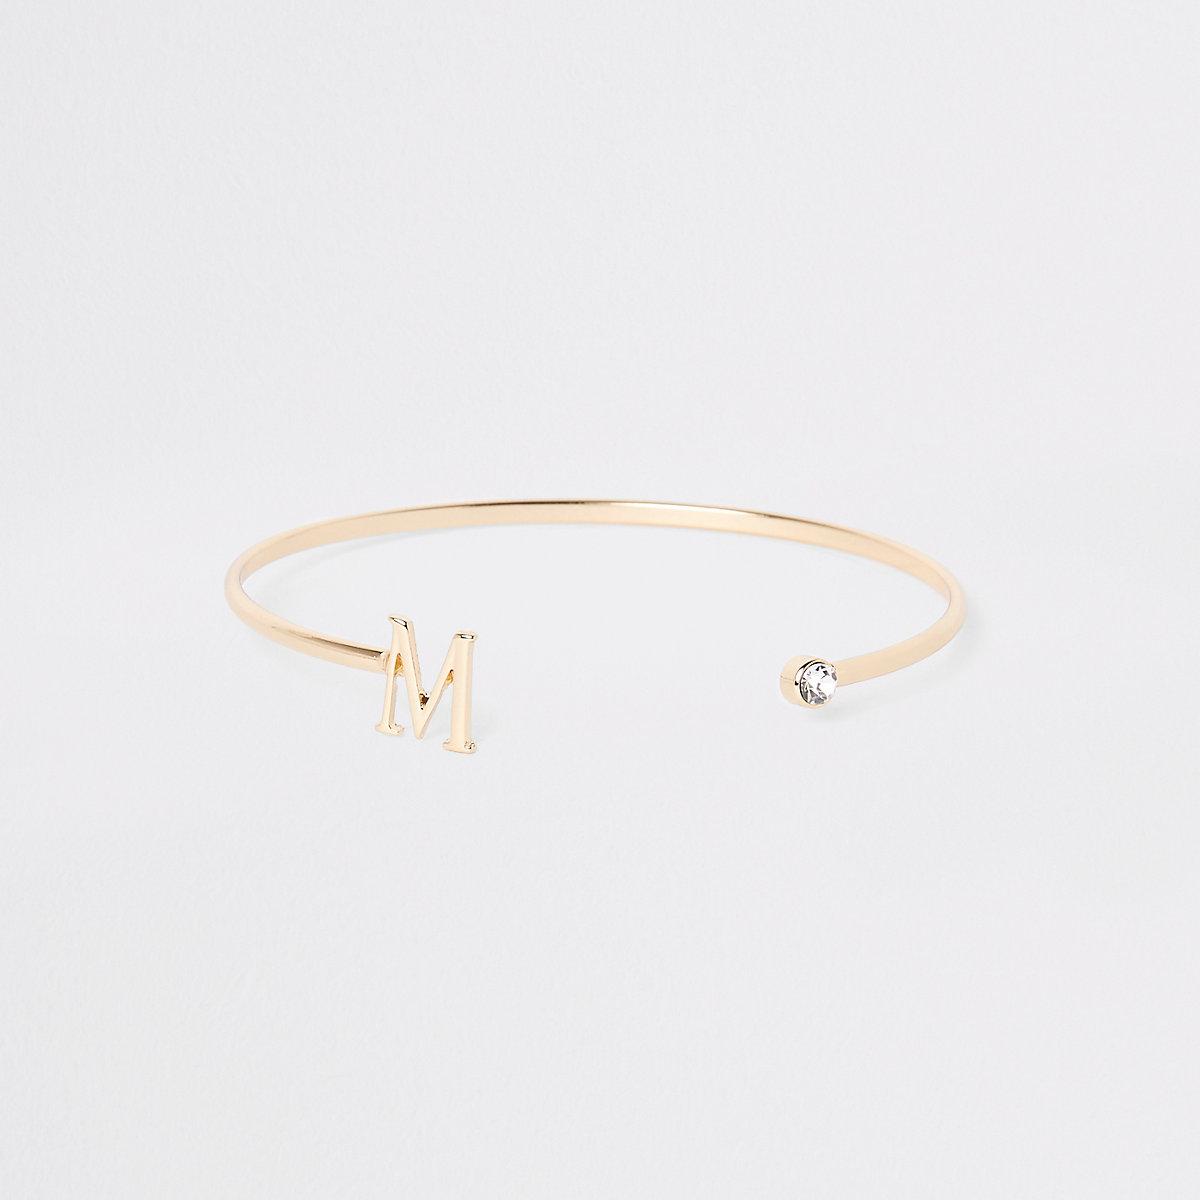 Bracelet Gold Plated M Initial Cuff